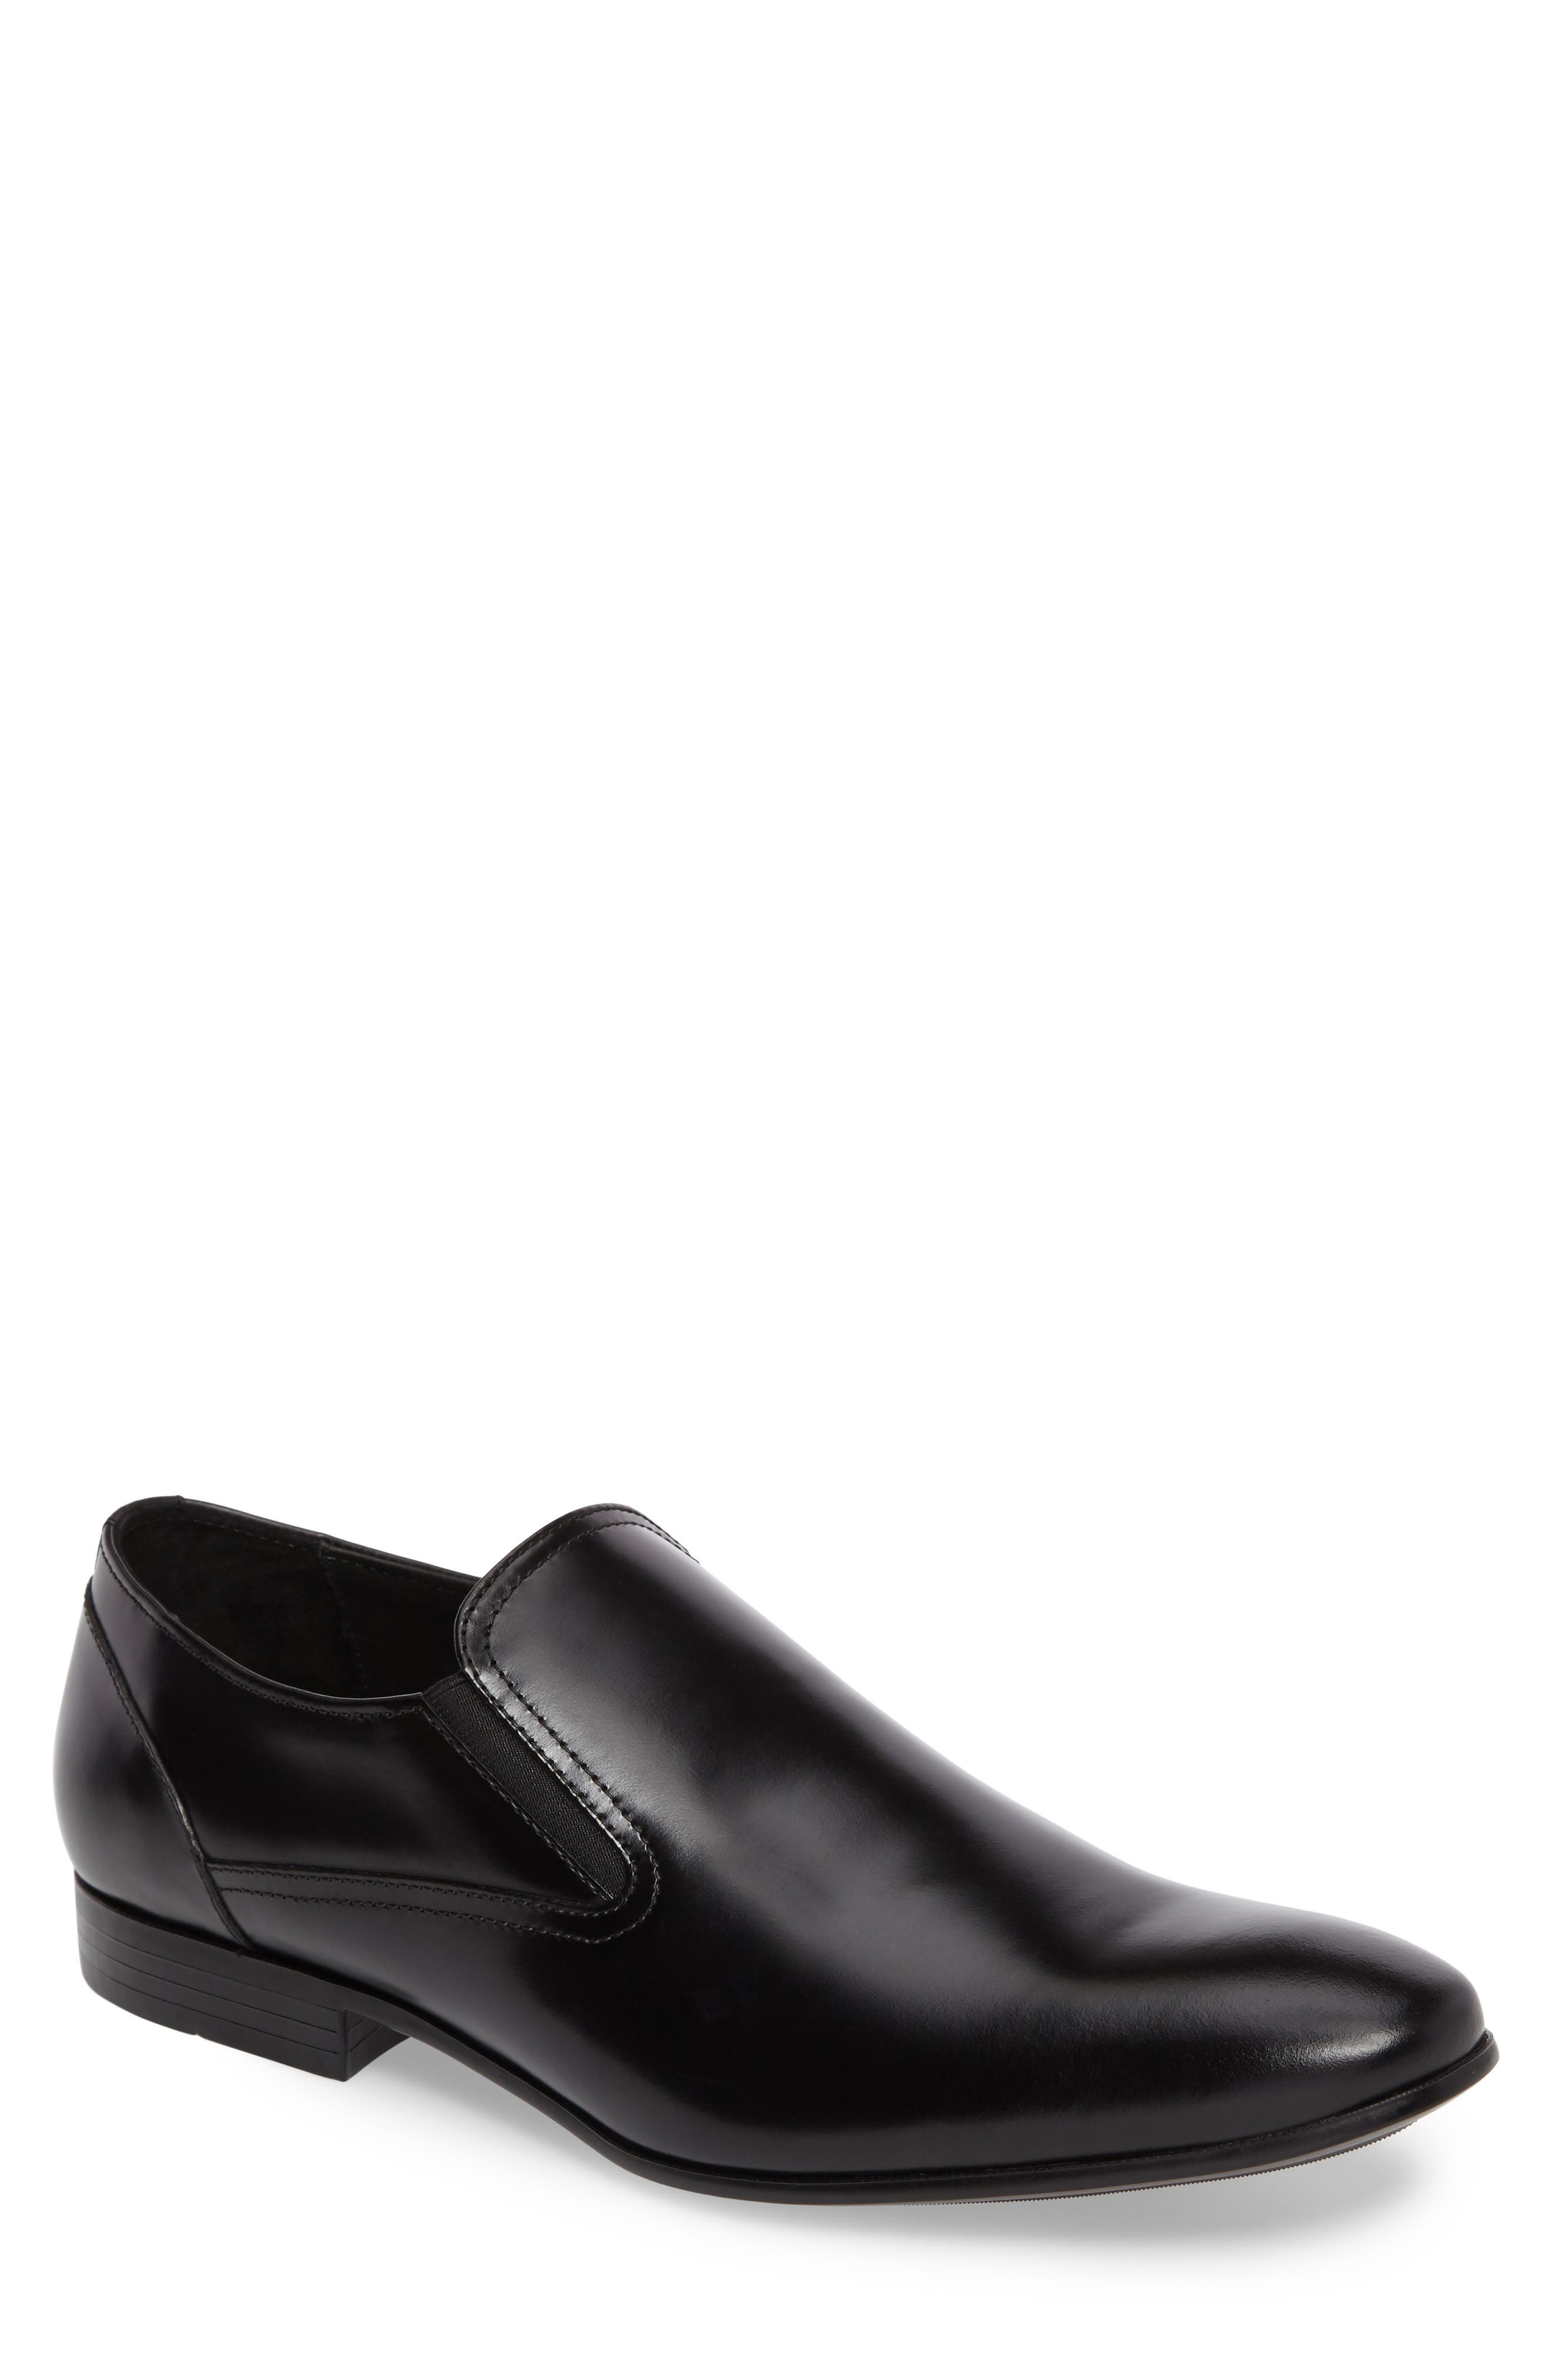 Venetian Loafer,                         Main,                         color, Black Leather